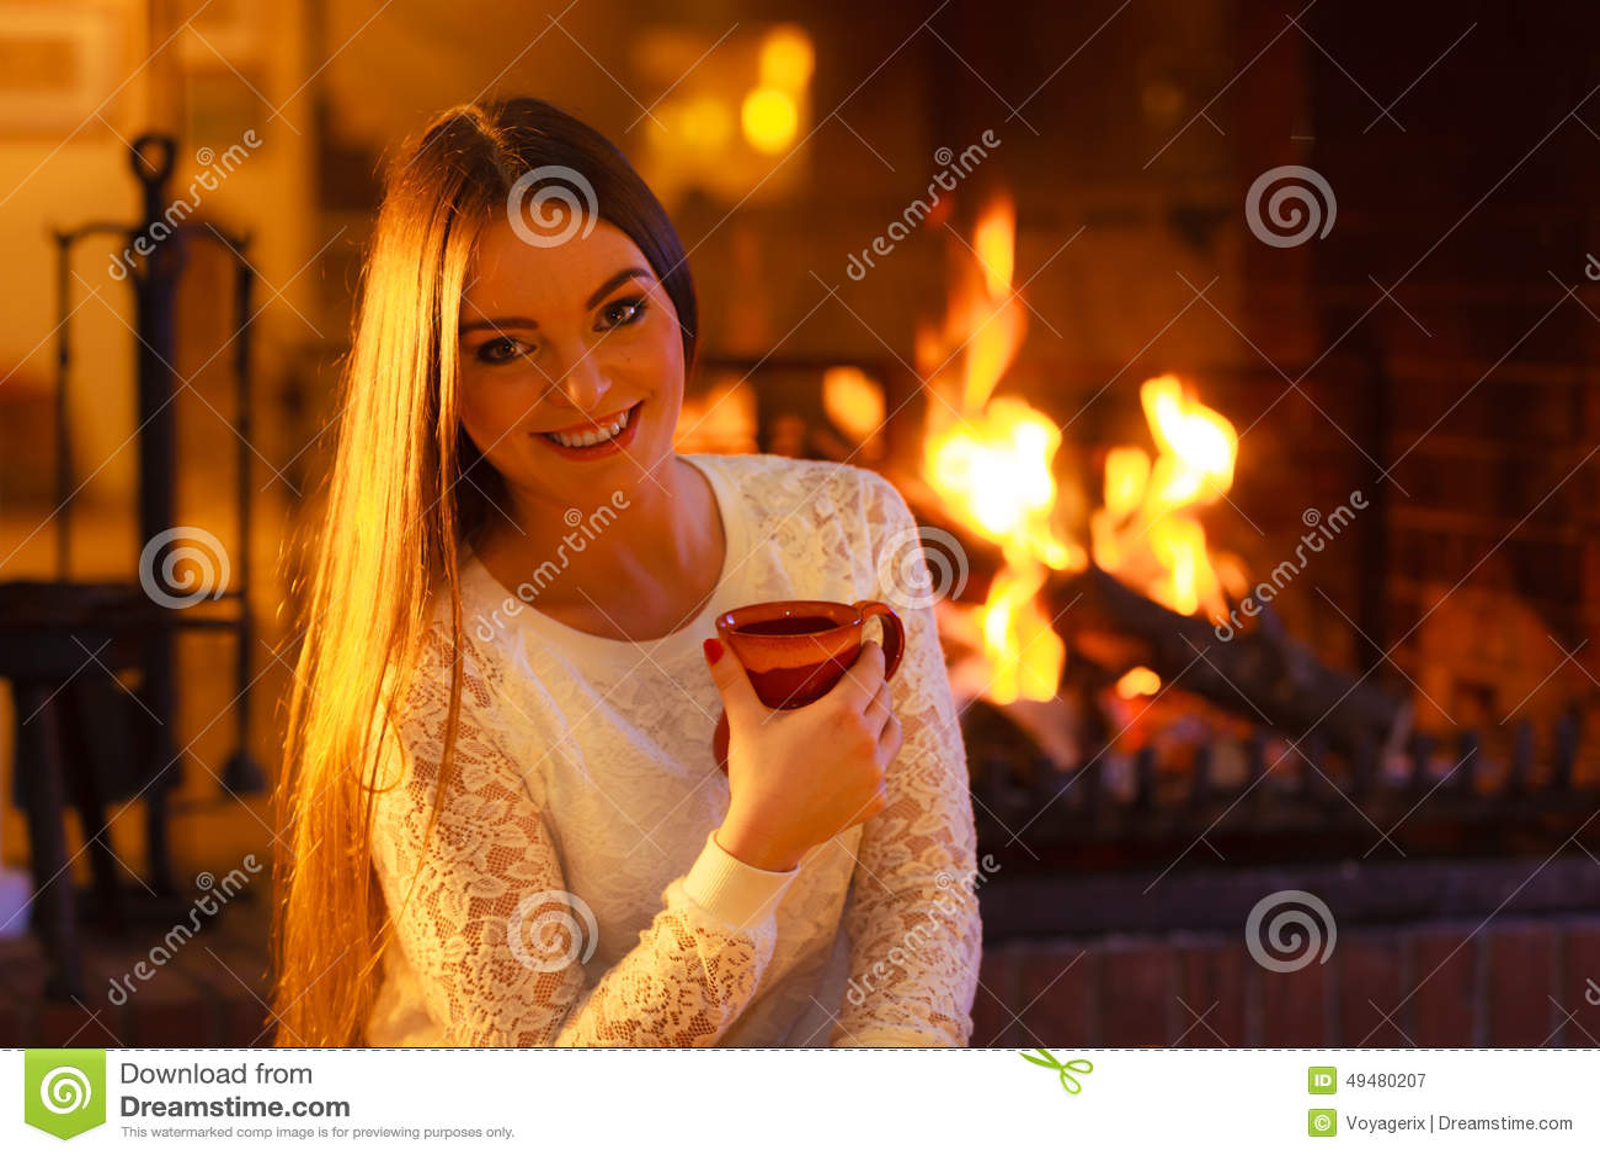 Woman Drinking Coffee Fireplace